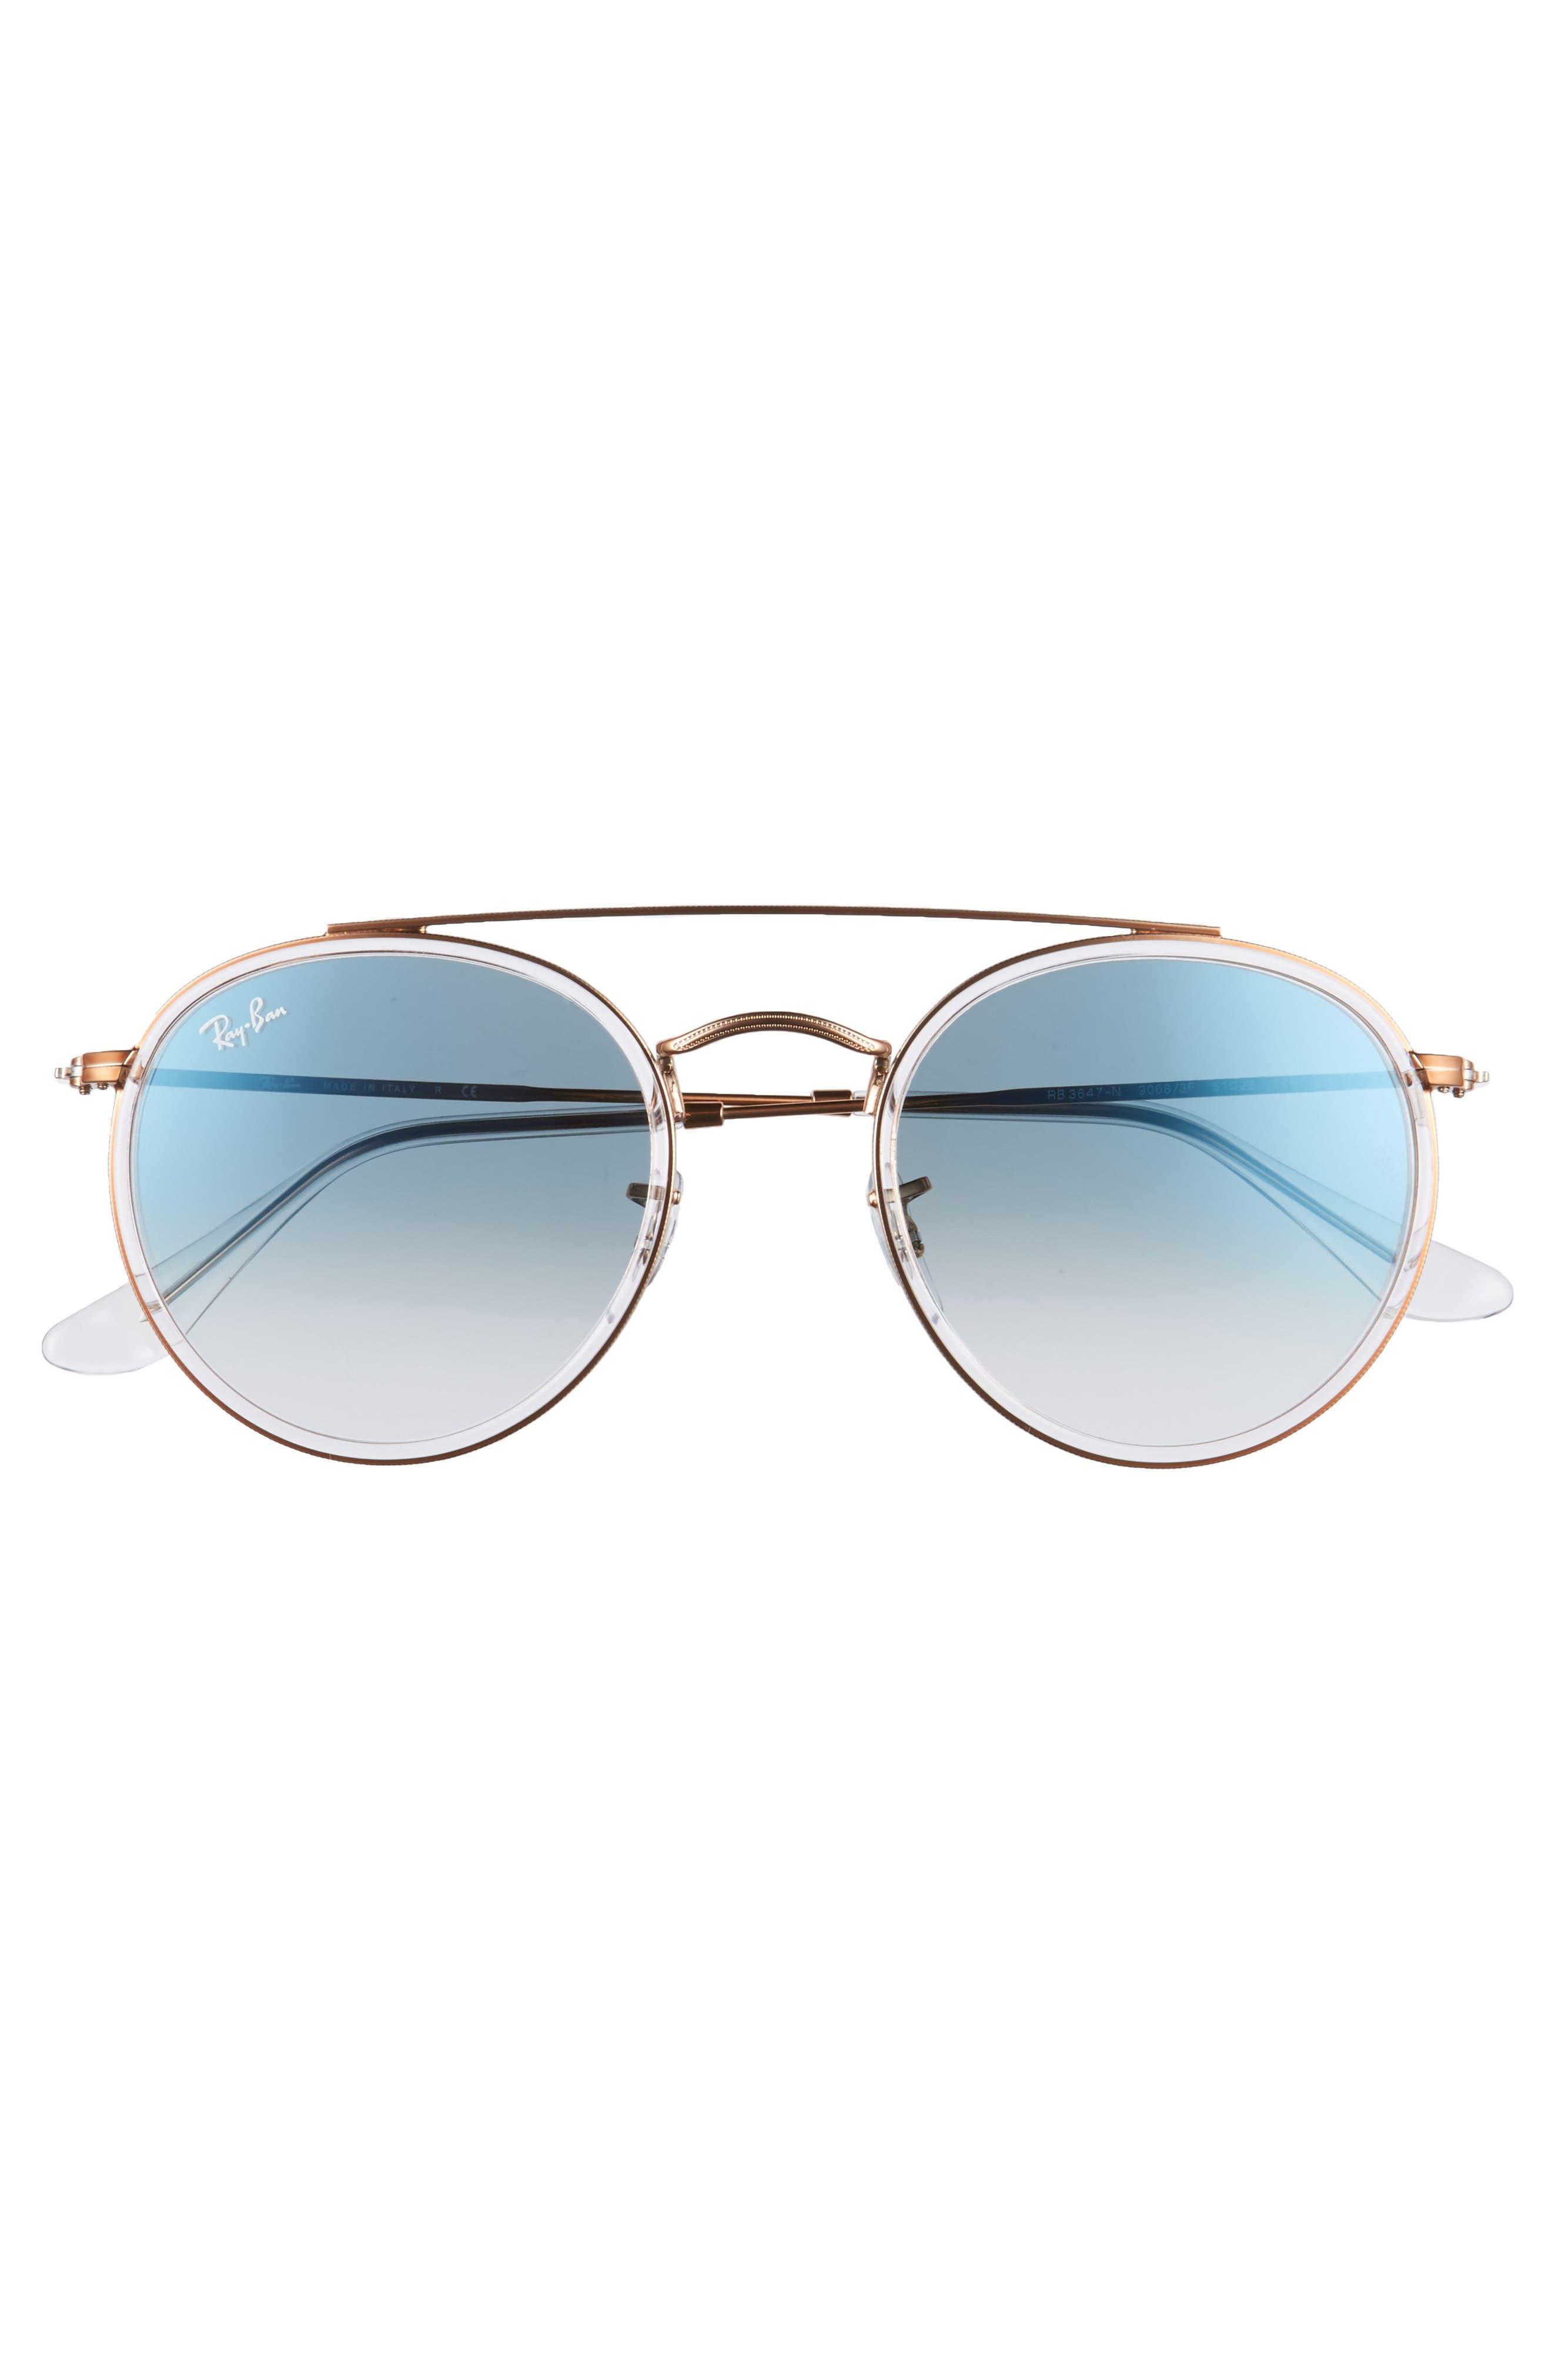 51mm Aviator Gradient Lens Sunglasses,                             Alternate thumbnail 9, color,